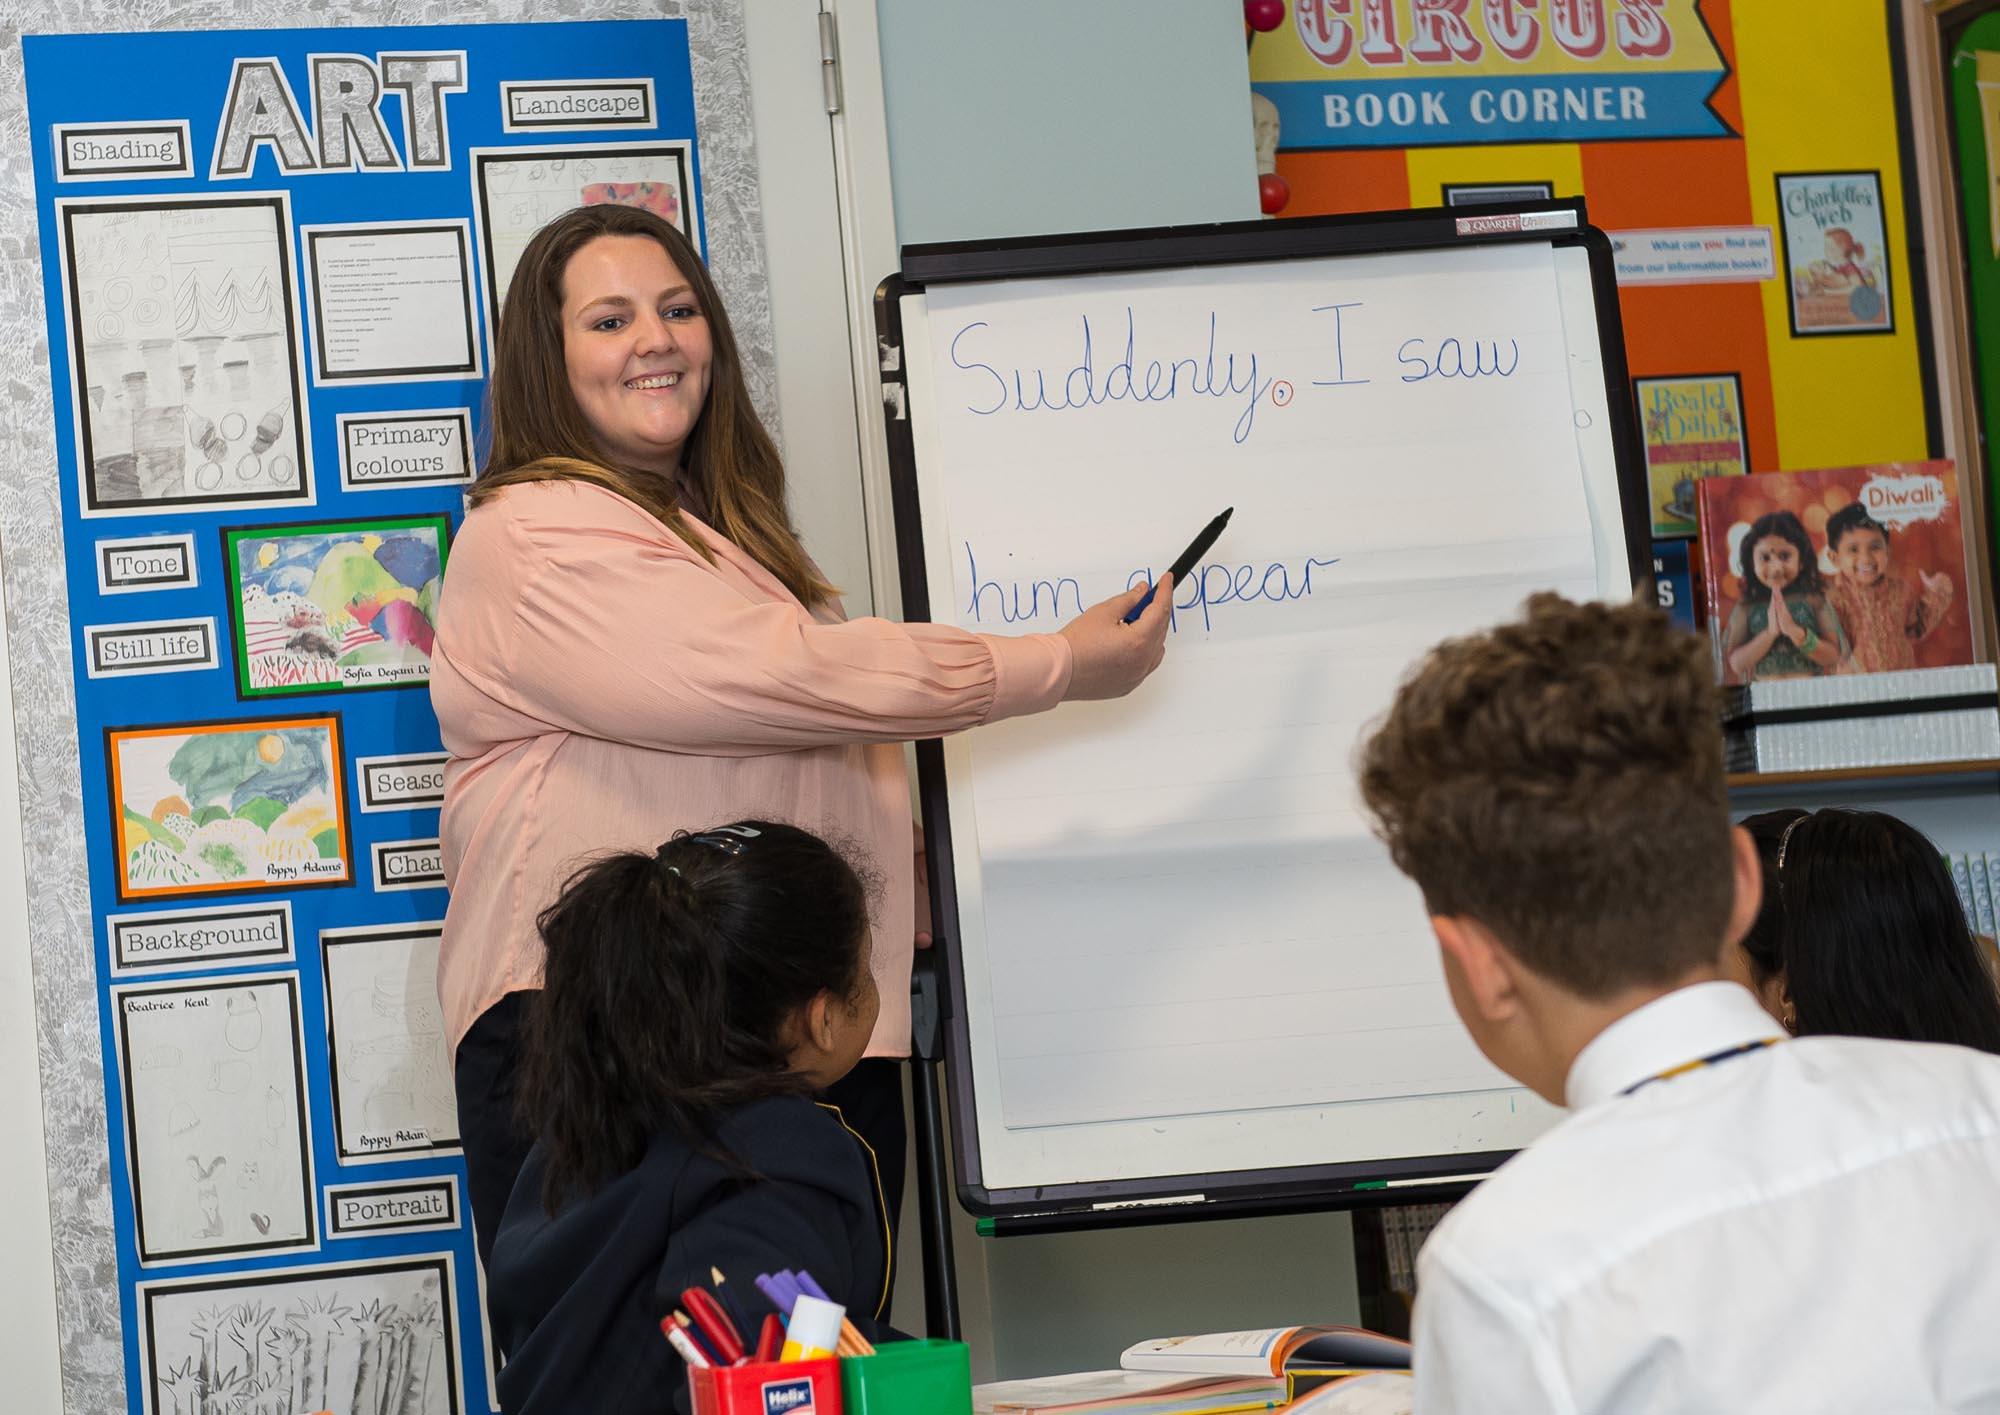 Teacher pointing at words on flipchart